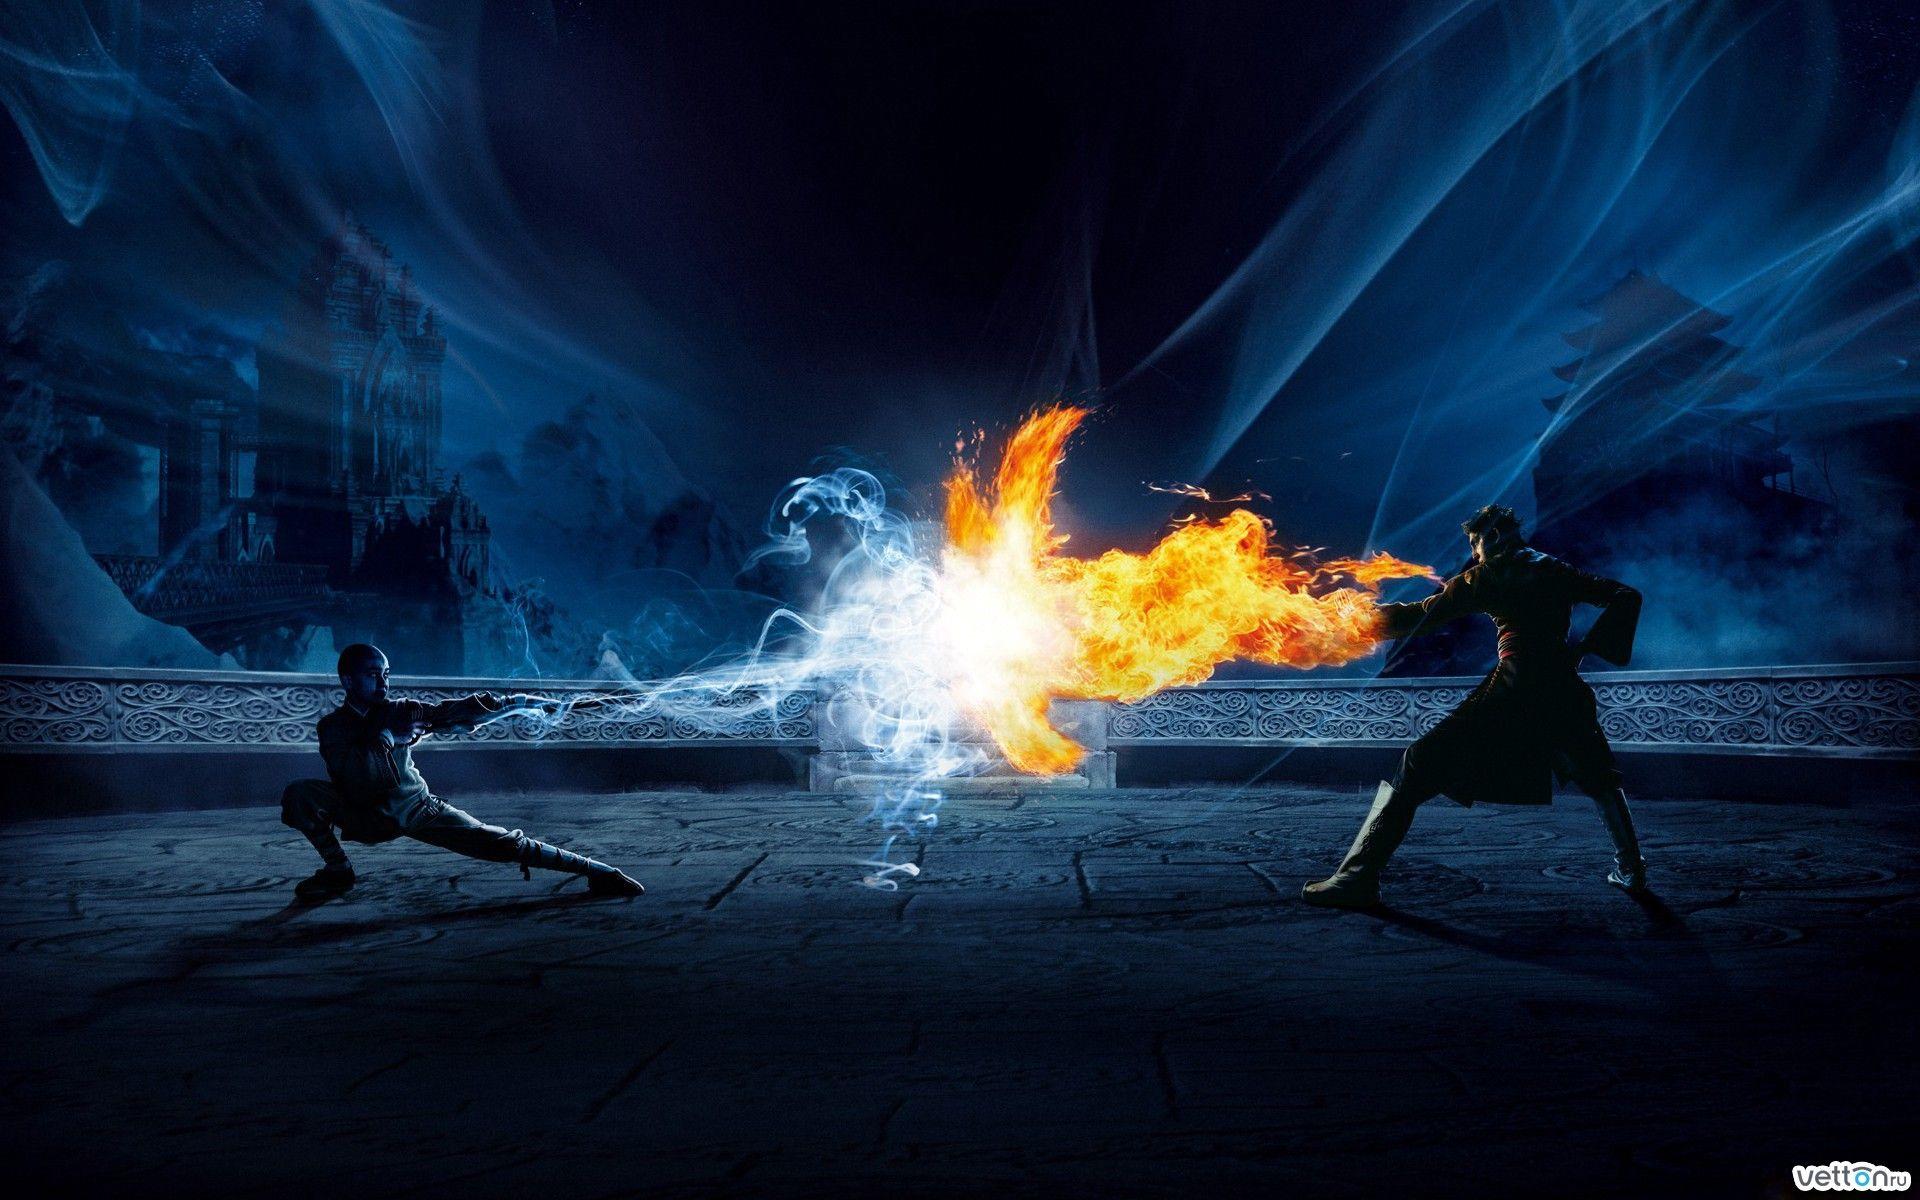 Fire Battle Air Magic Master Wallsfield Com Free Hd Wallpapers Air Magic Fantasy Magic Aesthetic